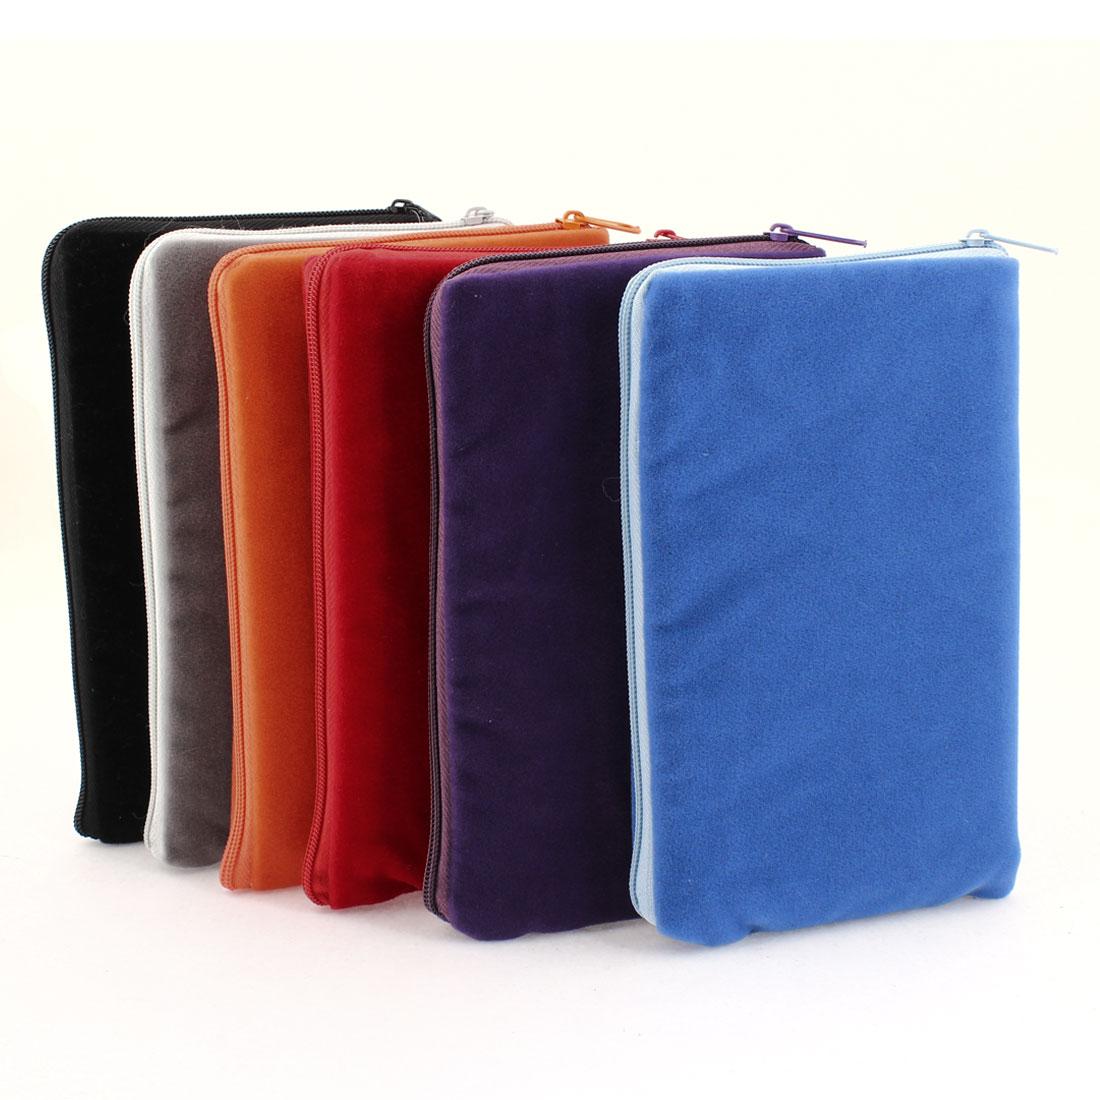 6 Pcs Soft Nylon Zipper Closure Wrist Pouch for Cell Phone